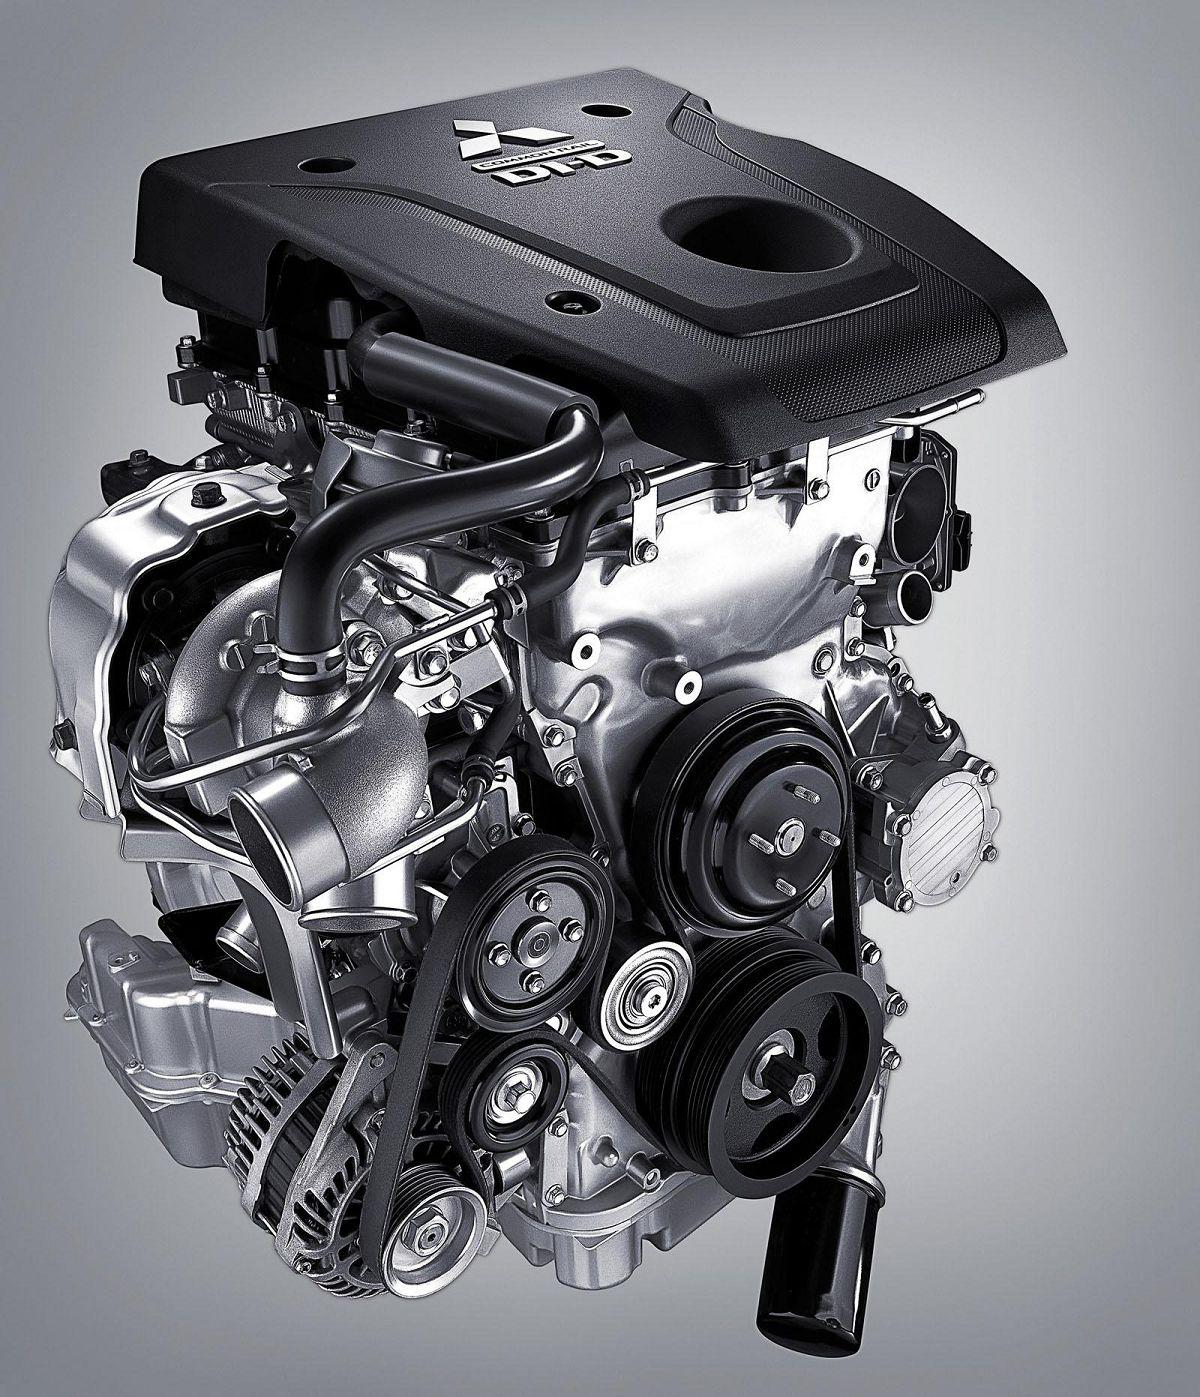 Mitsubishi New Pajero Sport 4wd Gt Premium: 首搭8速手自排-新款Mitsubishi Pajero Sport正式登場